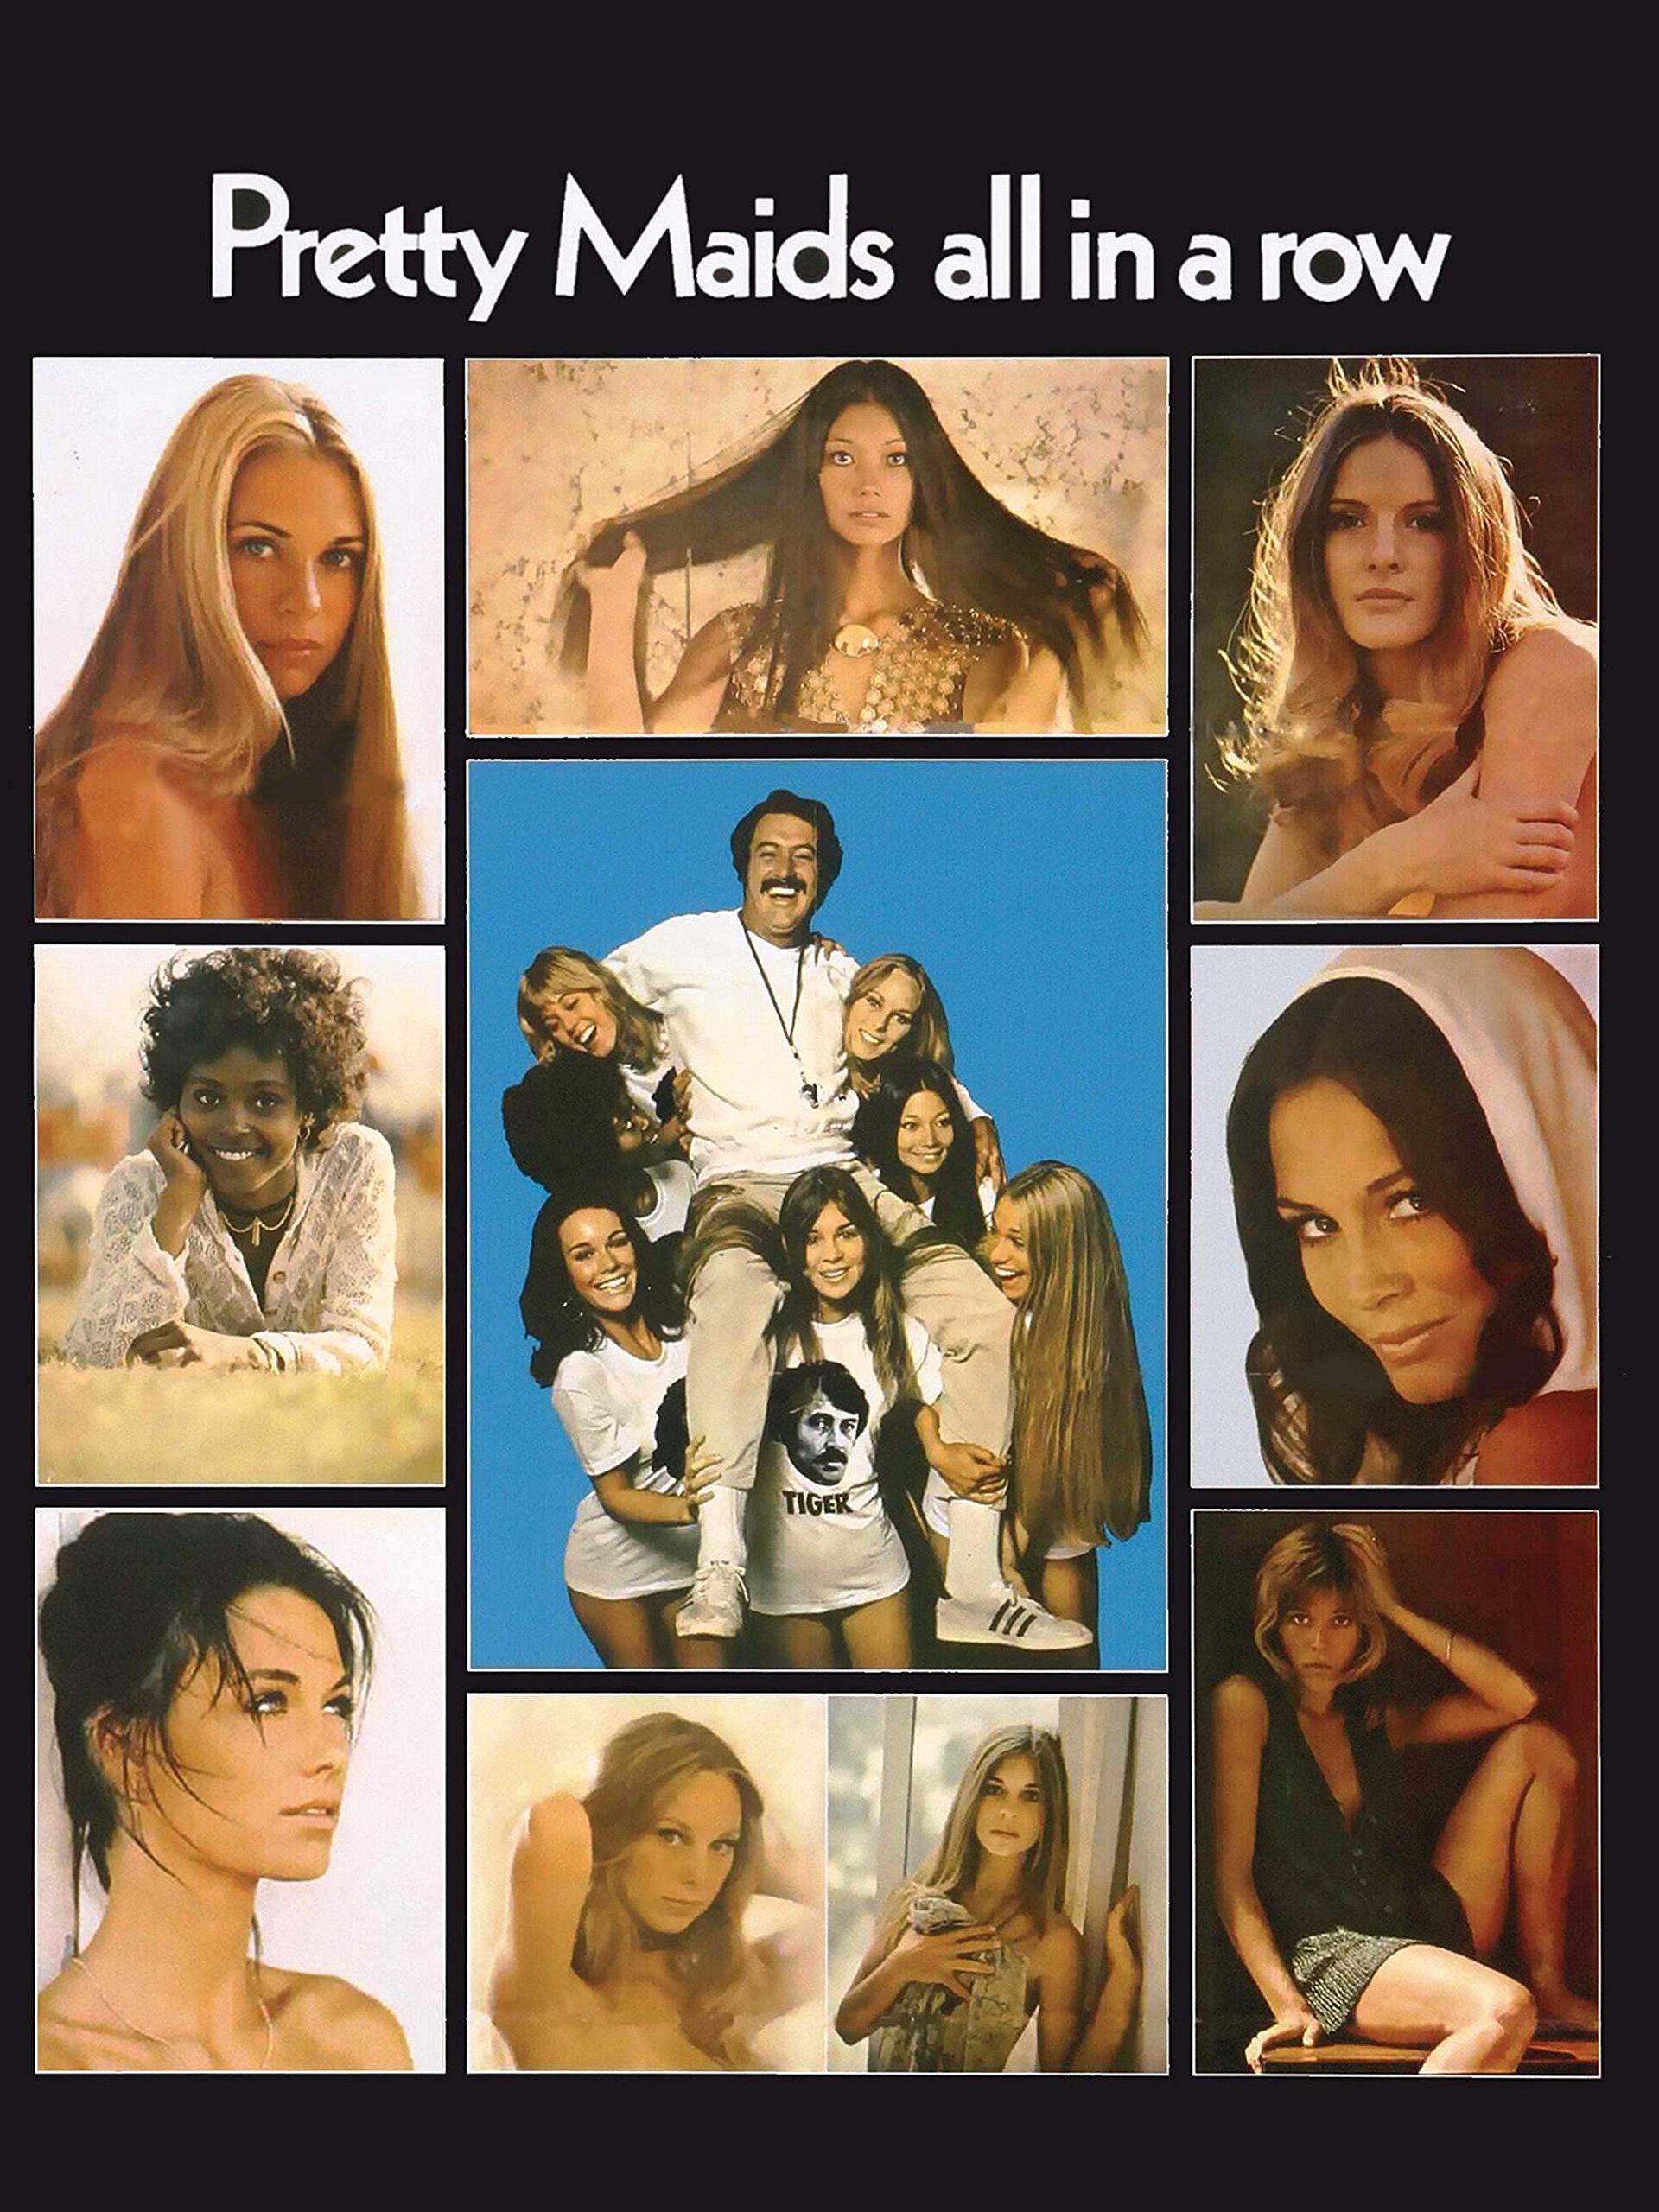 Aubrey Peeples,Jessica Drake Erotic video Barbara Trentham,Ynna Asistio (b. 1991)